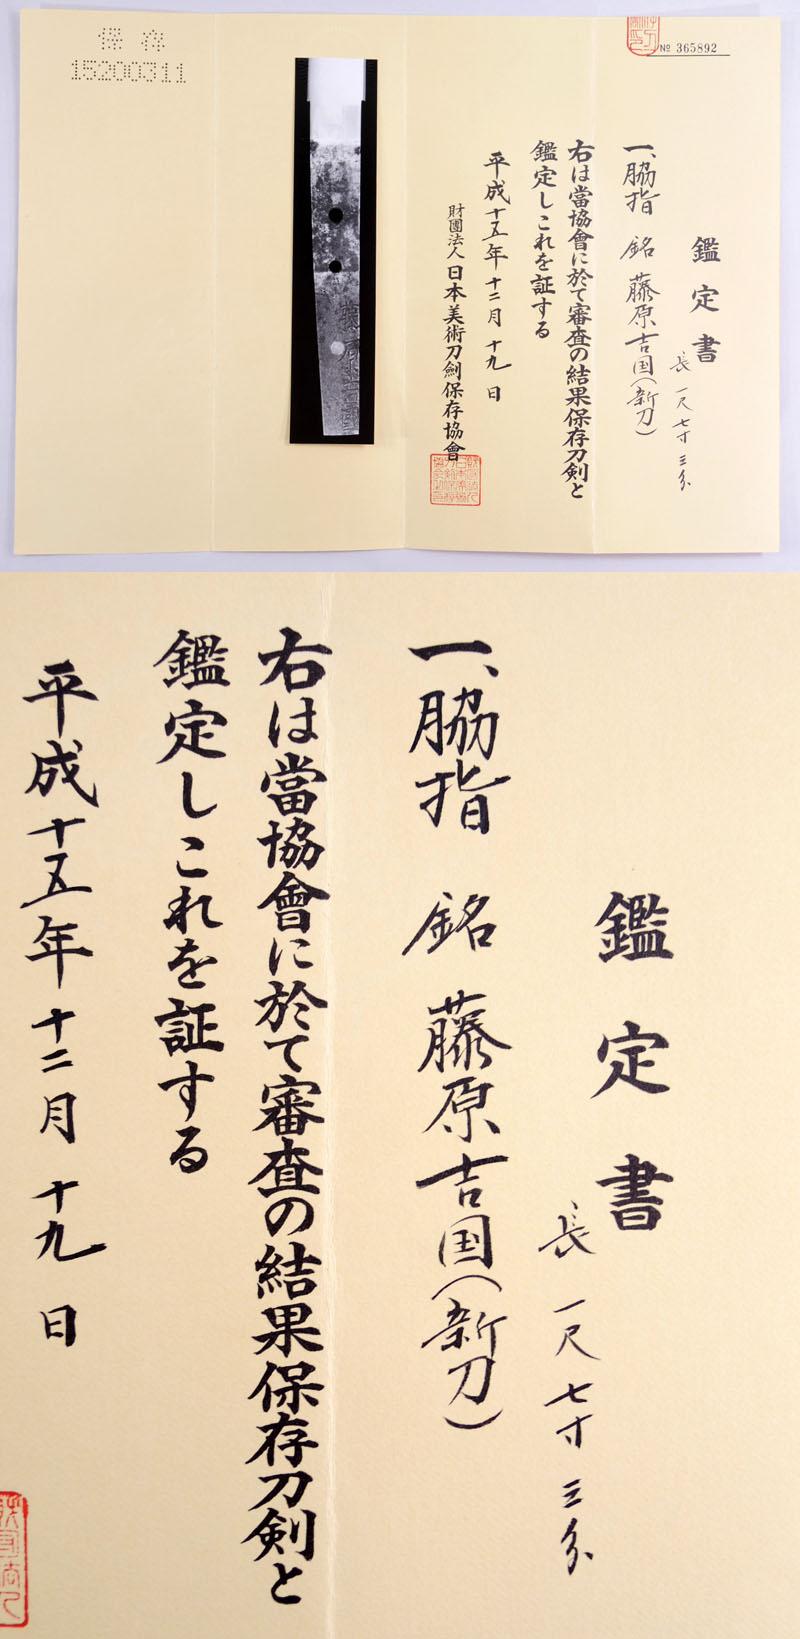 藤原吉国 Picture of Certificate